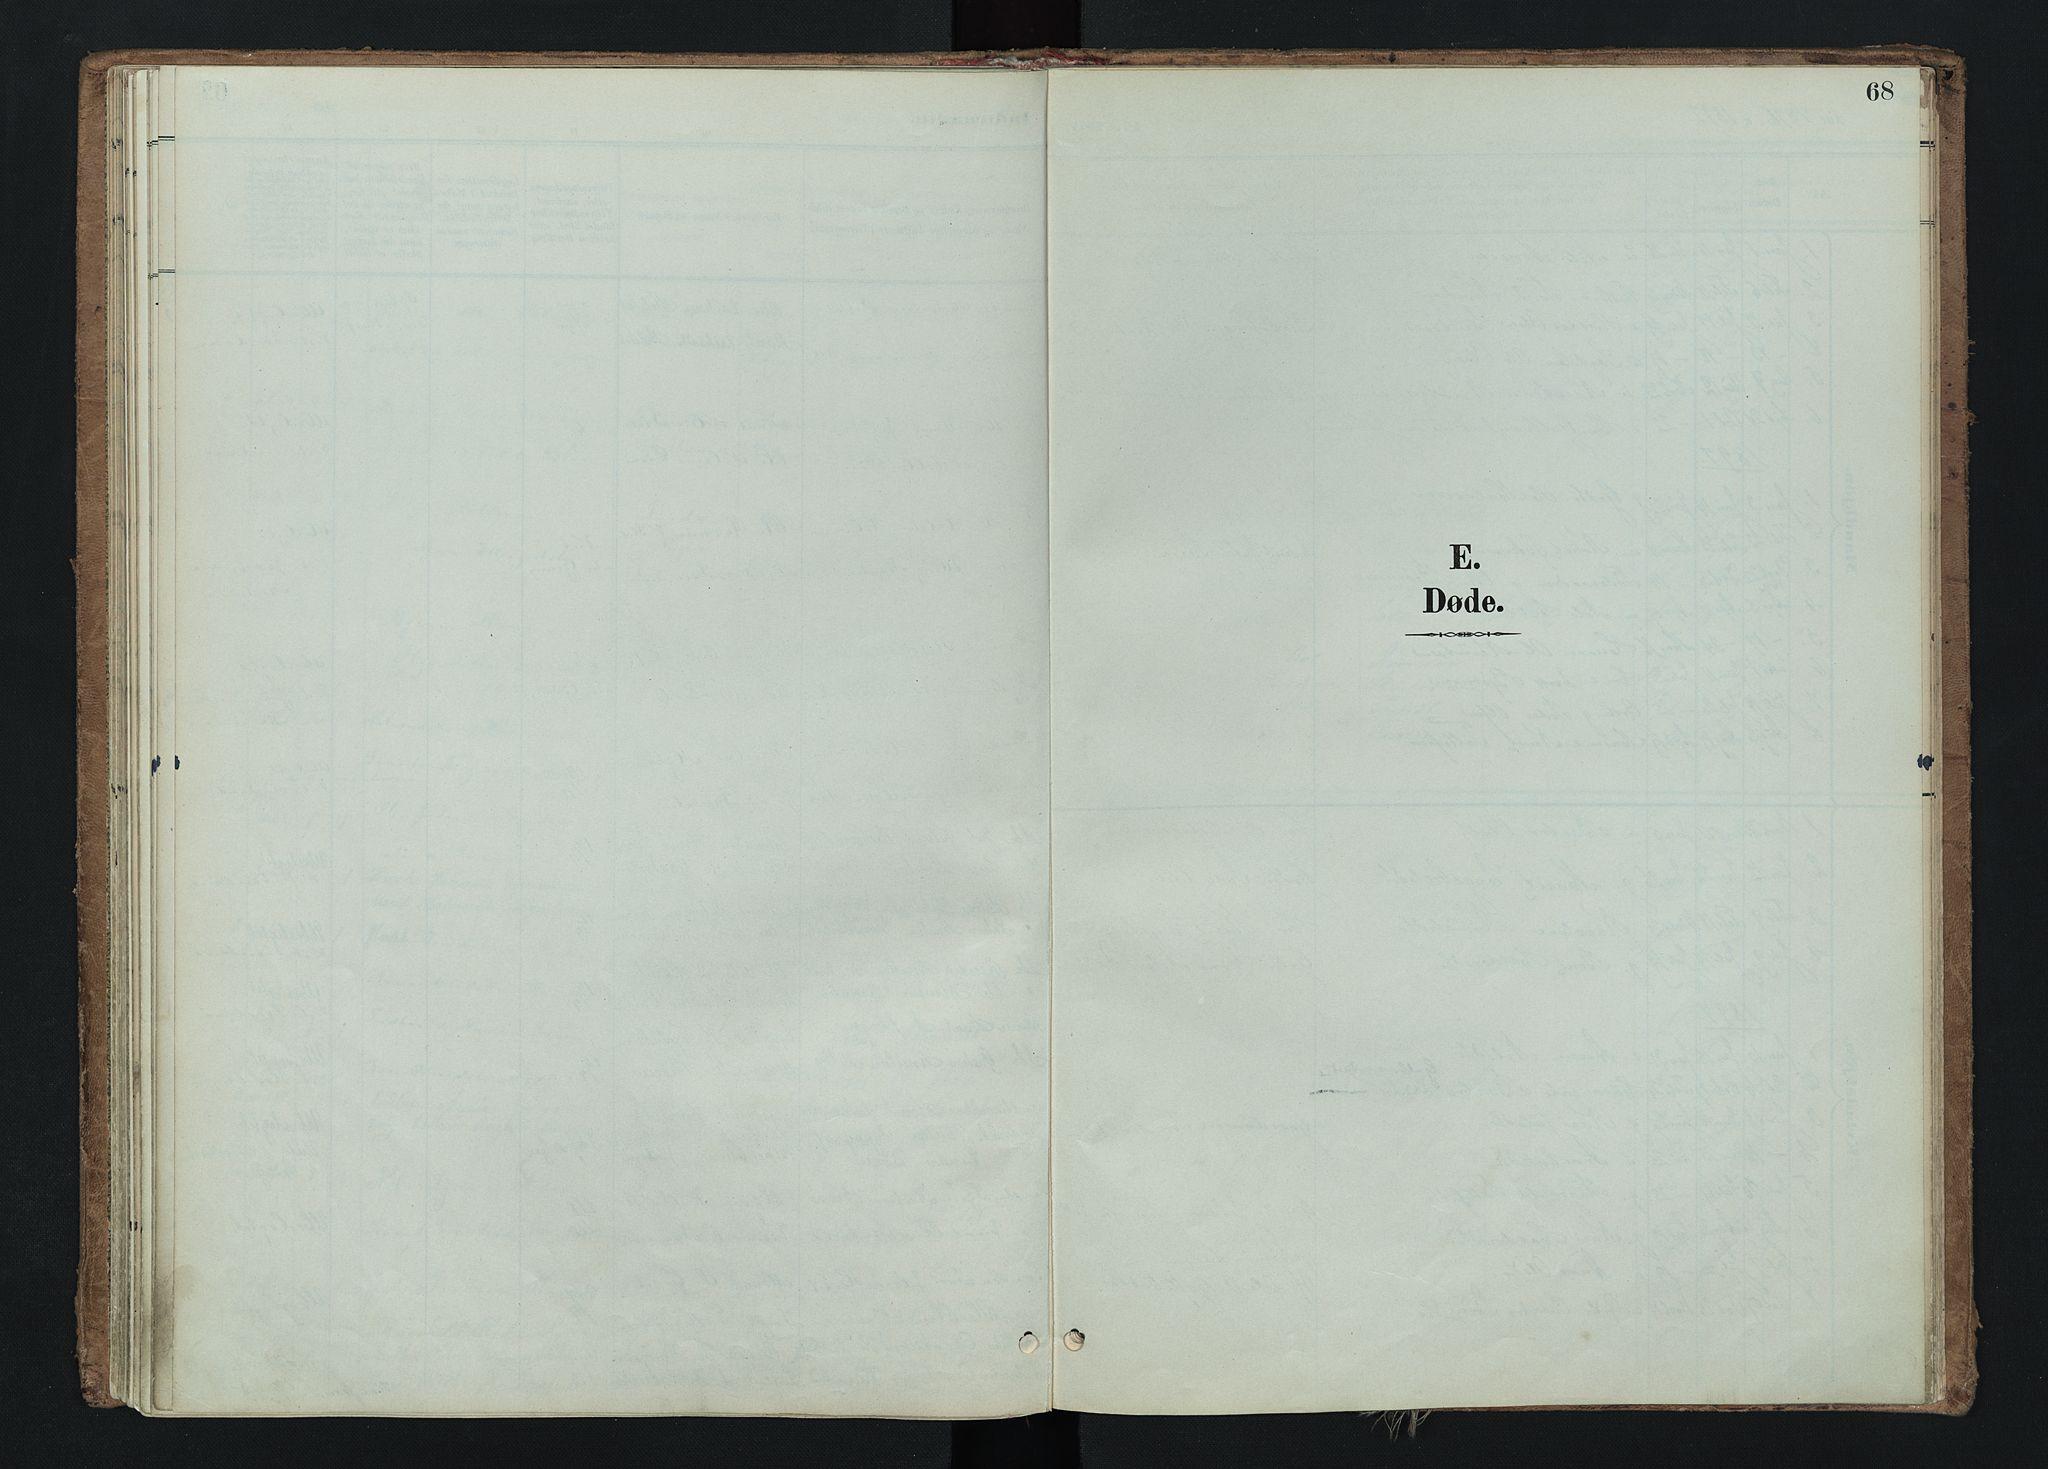 SAH, Nord-Aurdal prestekontor, Ministerialbok nr. 15, 1896-1914, s. 68